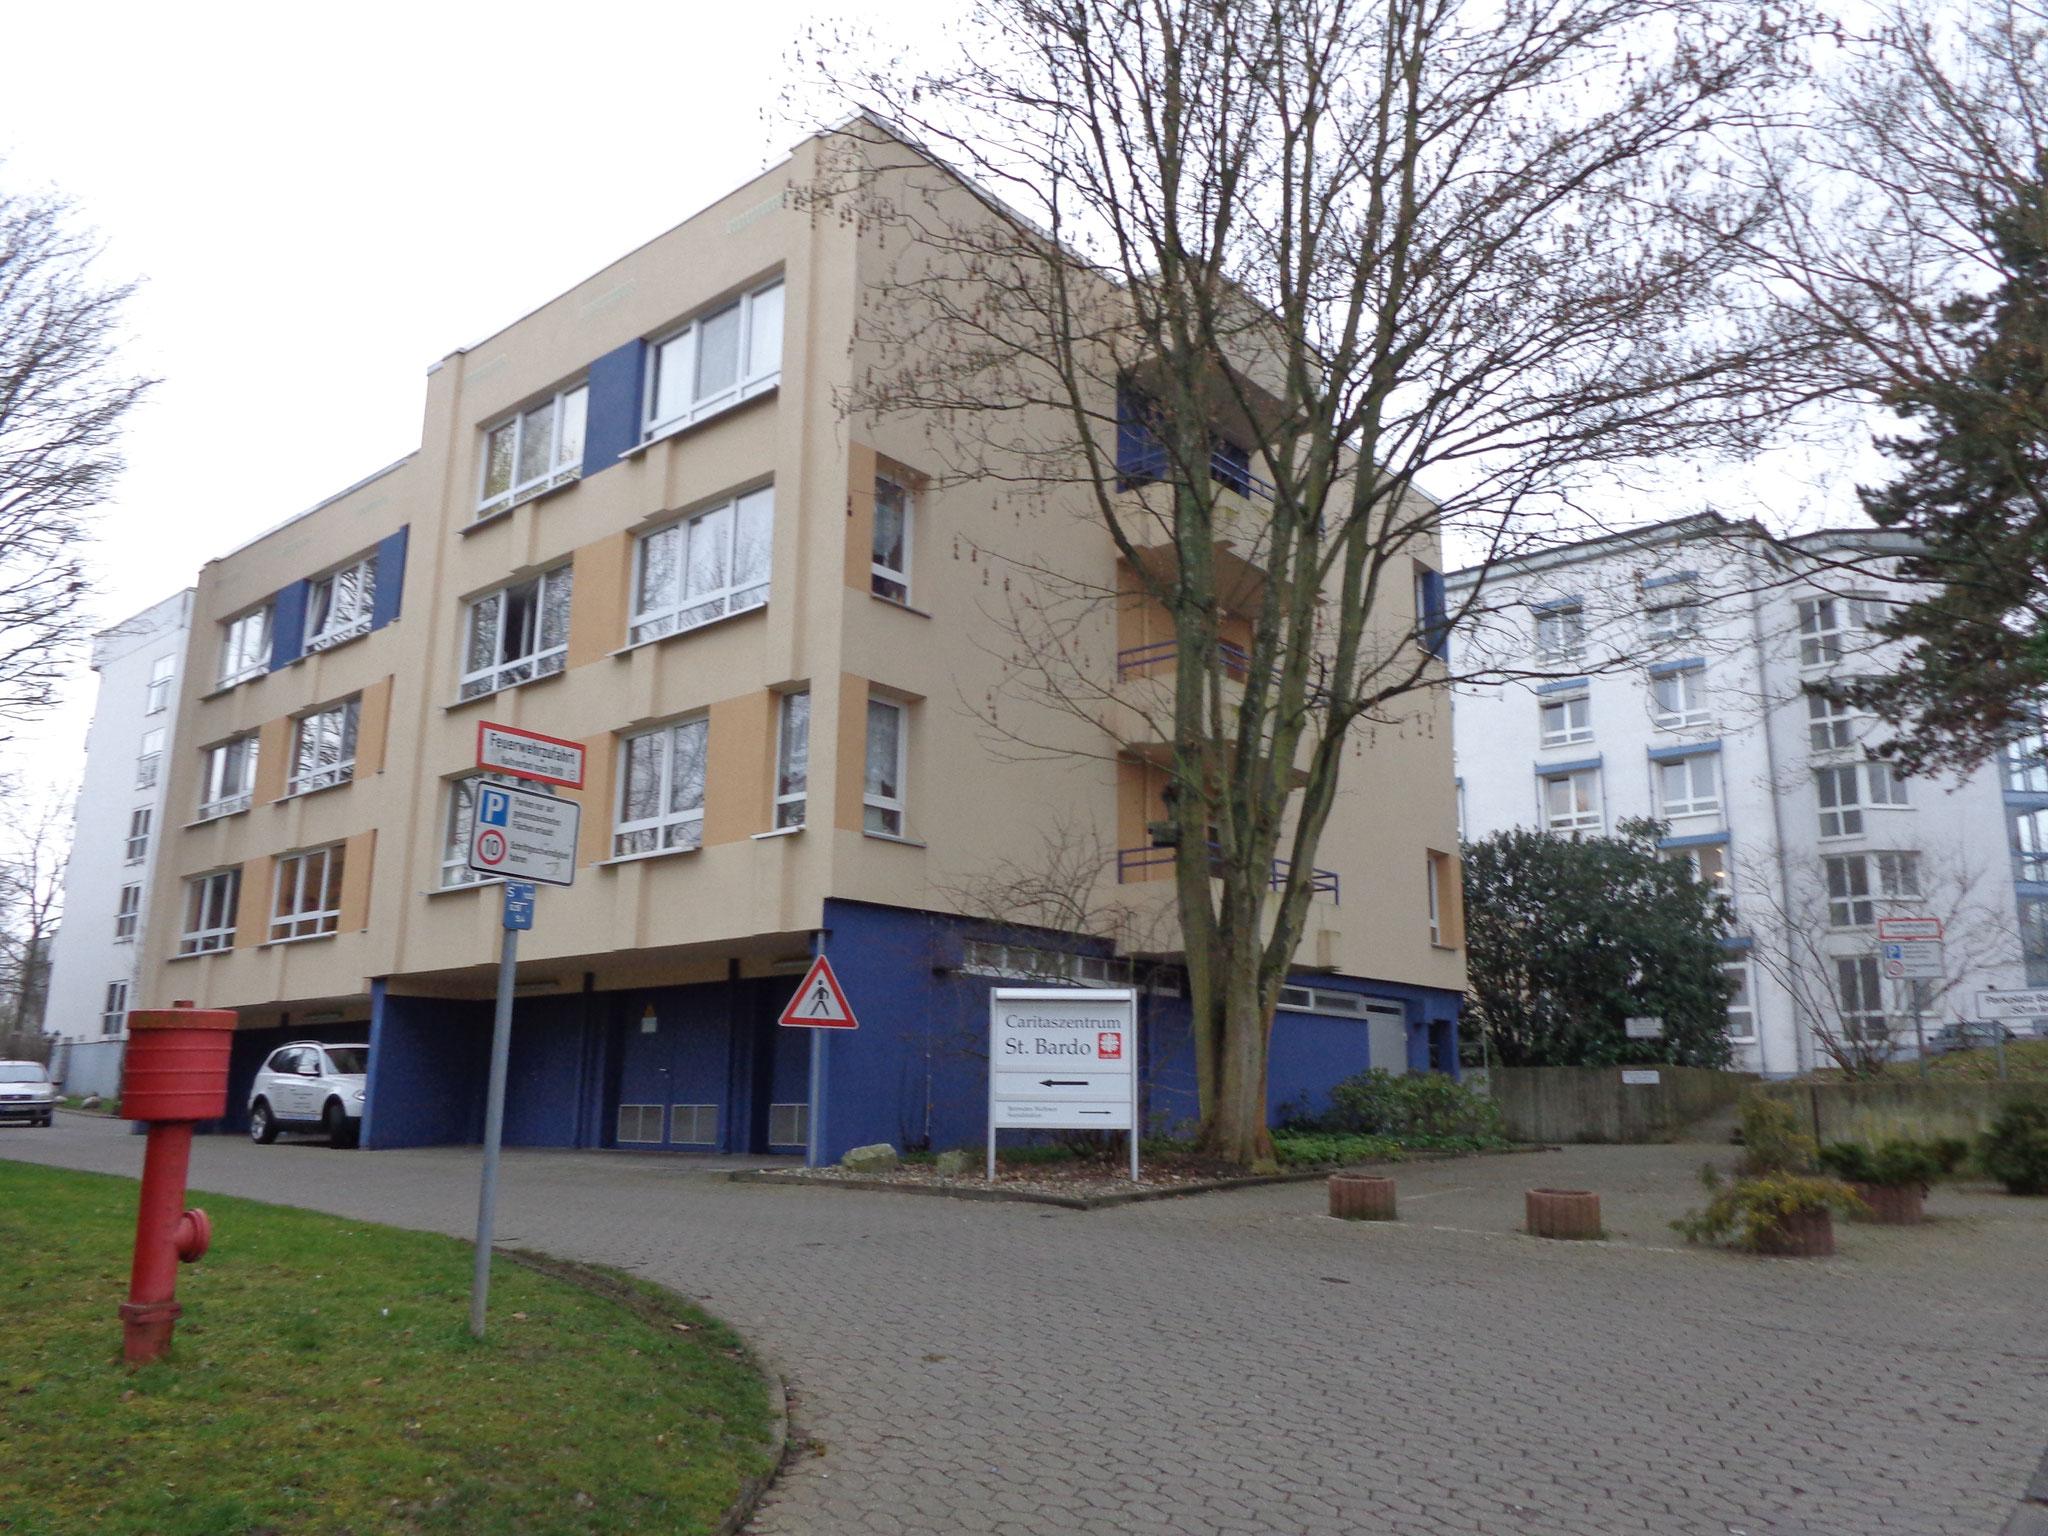 Caritaszentrum St. Bardo; Friedberg